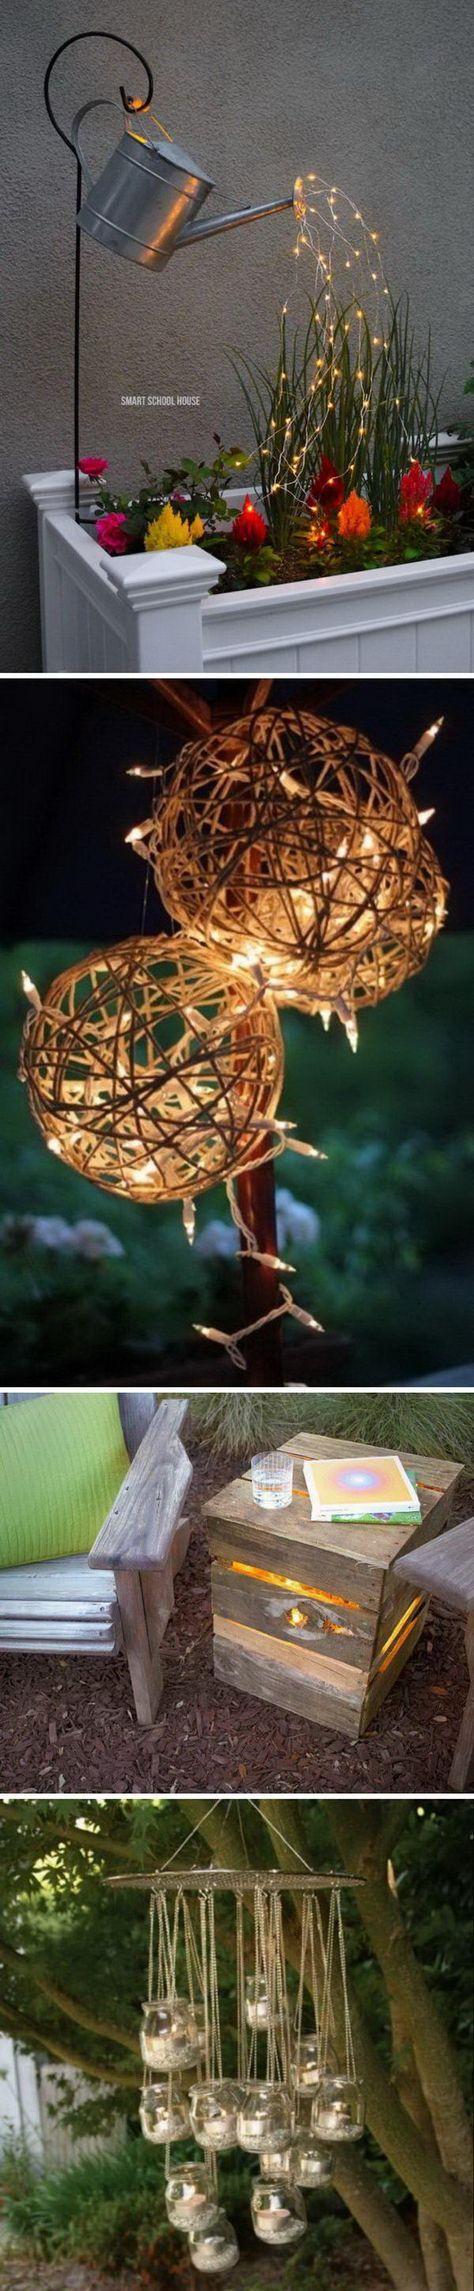 Amazing Outdoor Lighting Ideas.